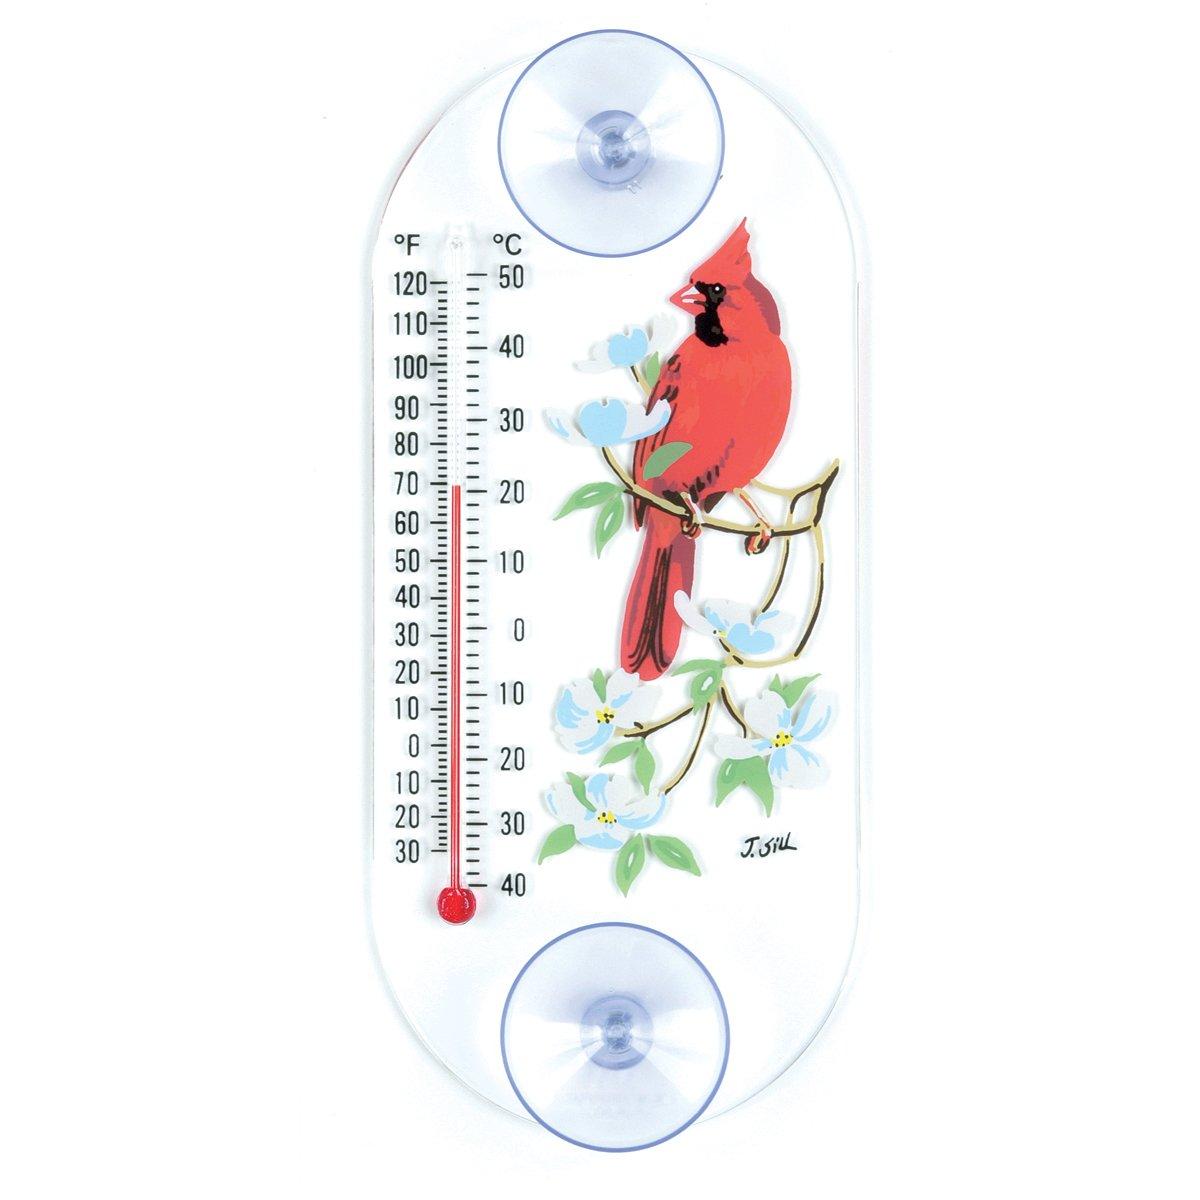 Aspects 193 Cardinal/Dogwood Window Thermometer, 8-Inch